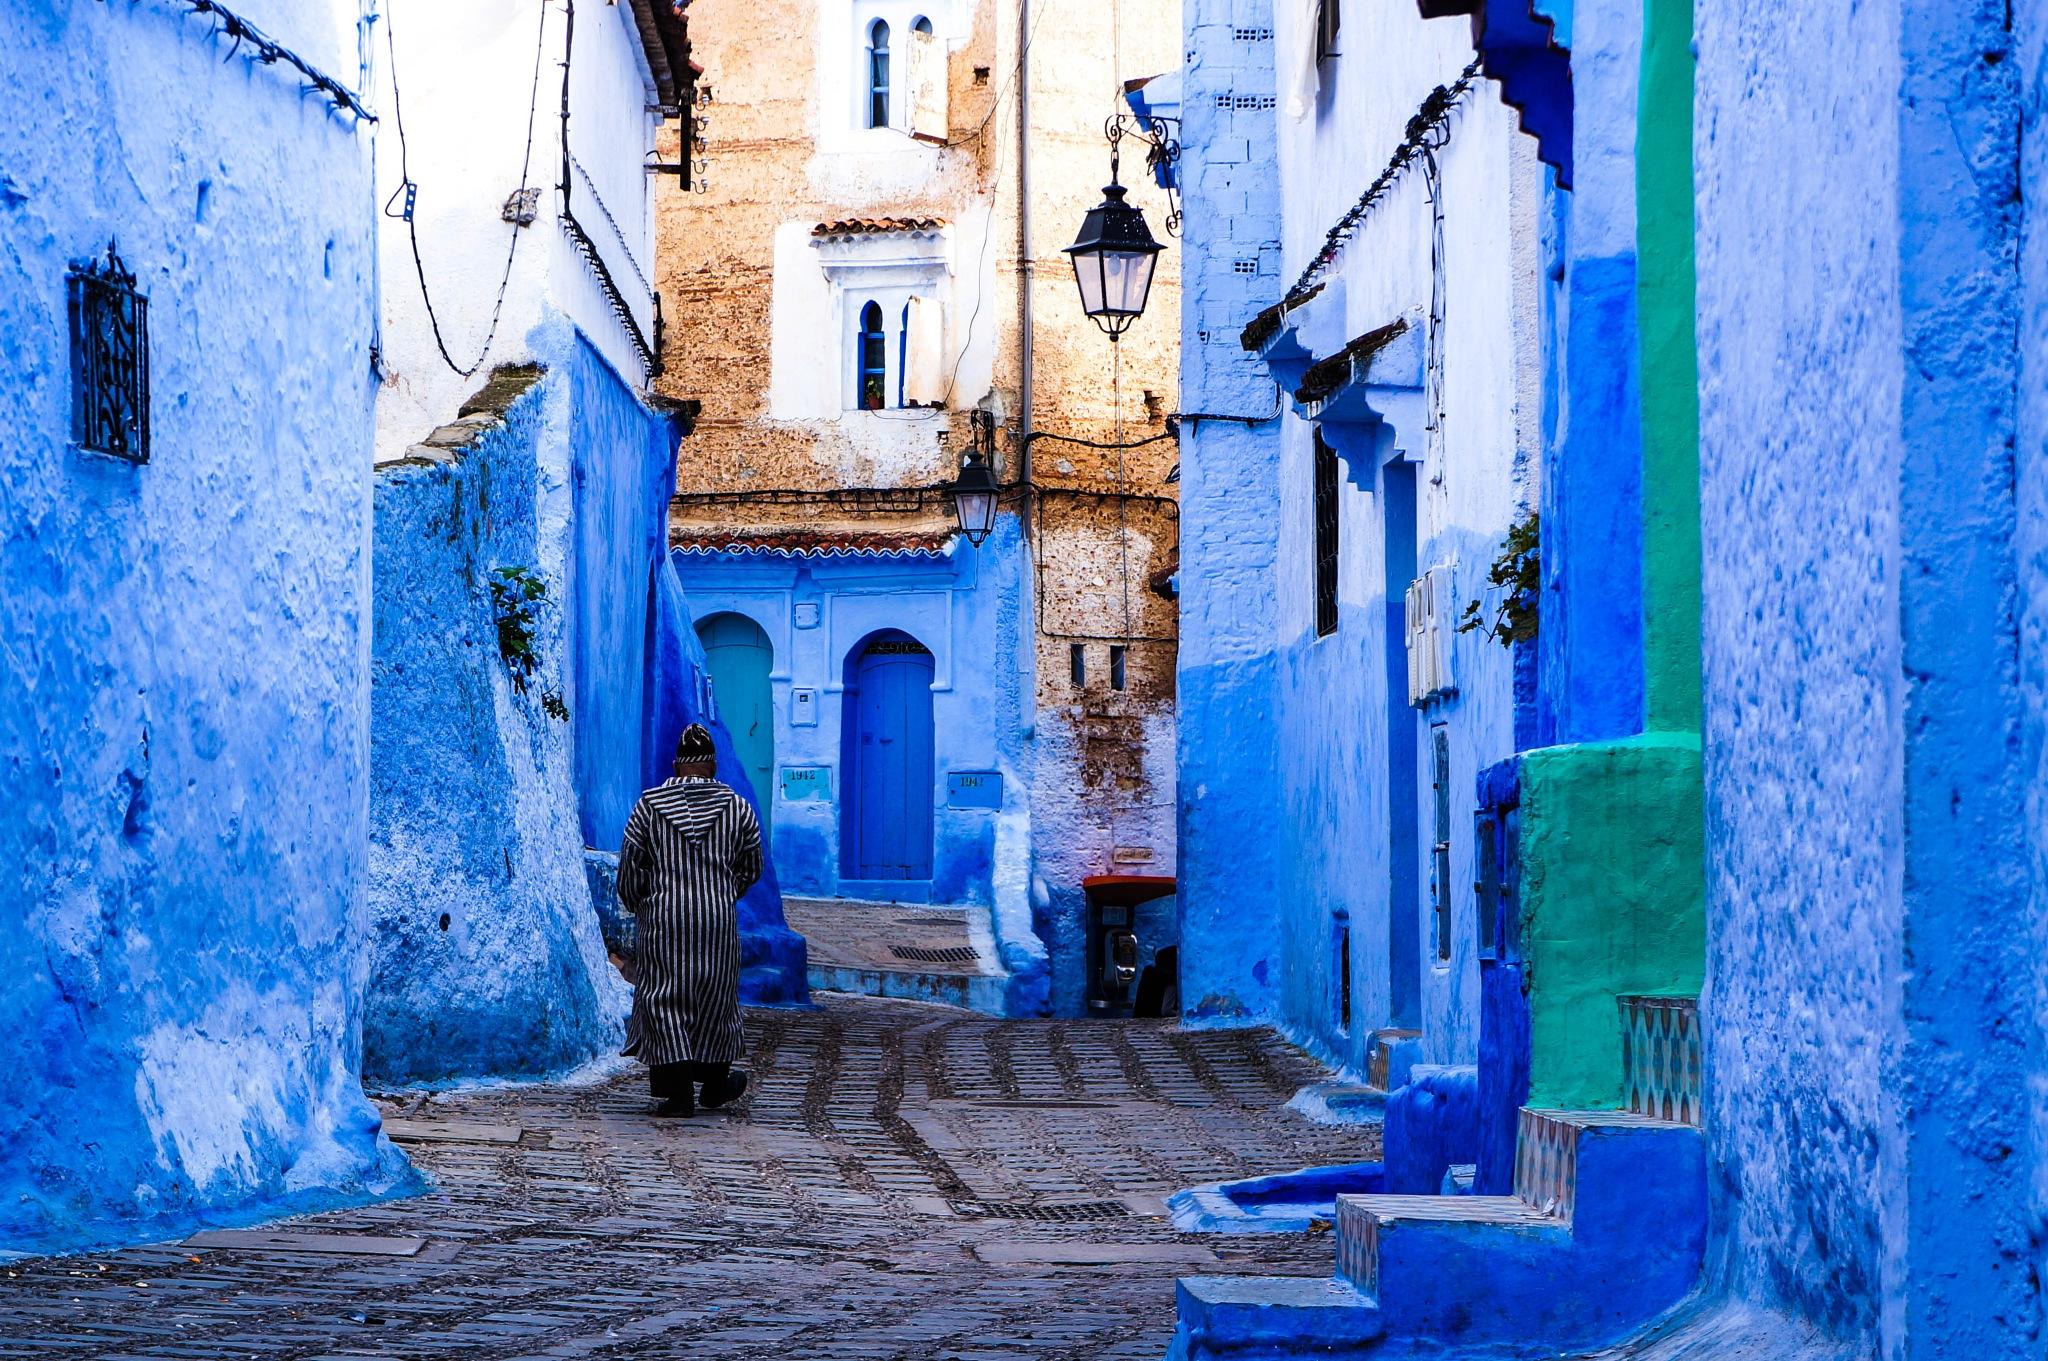 a colorful city by haddouchitarik